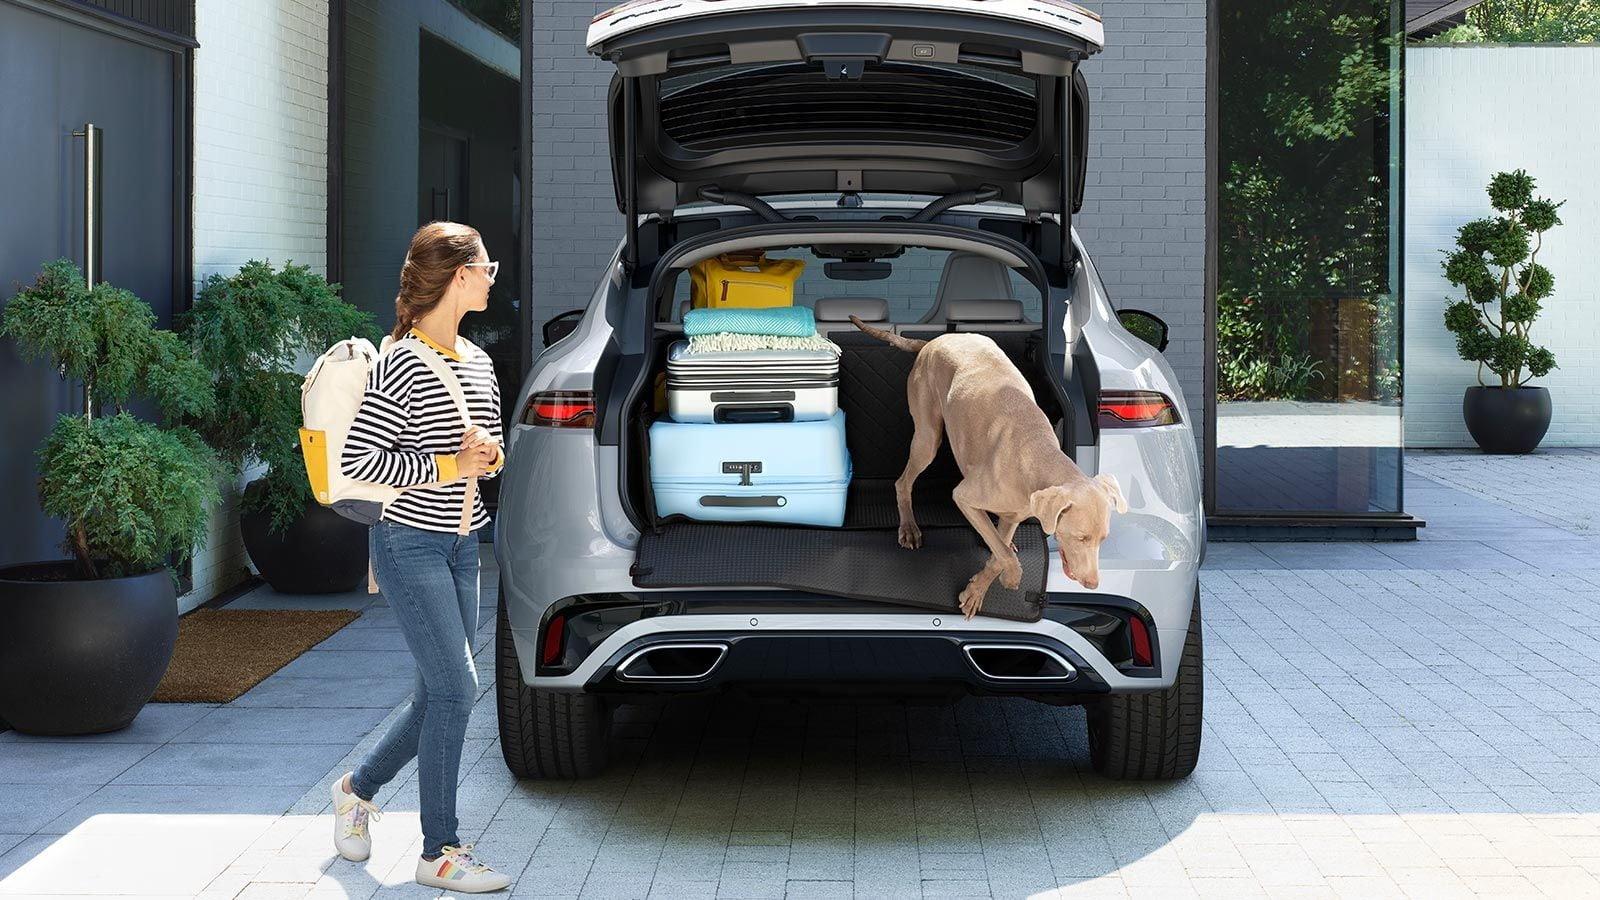 Luxury vehicle, Automotive design, Car